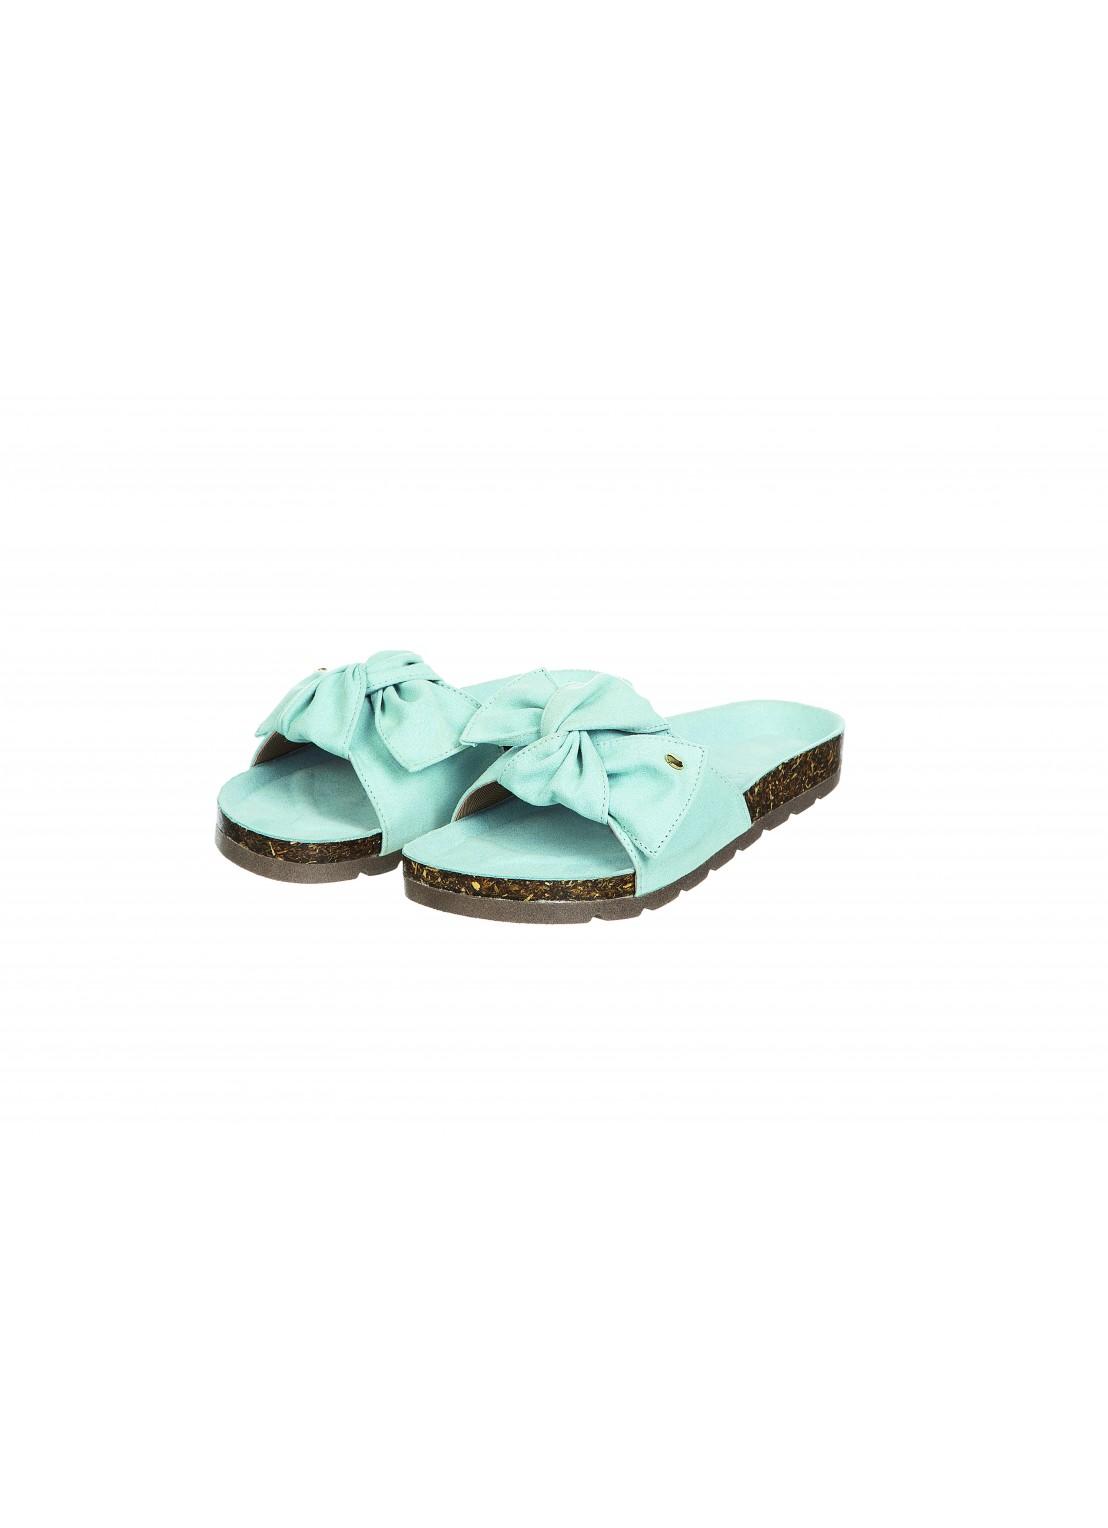 Sandalia piso azul cielo